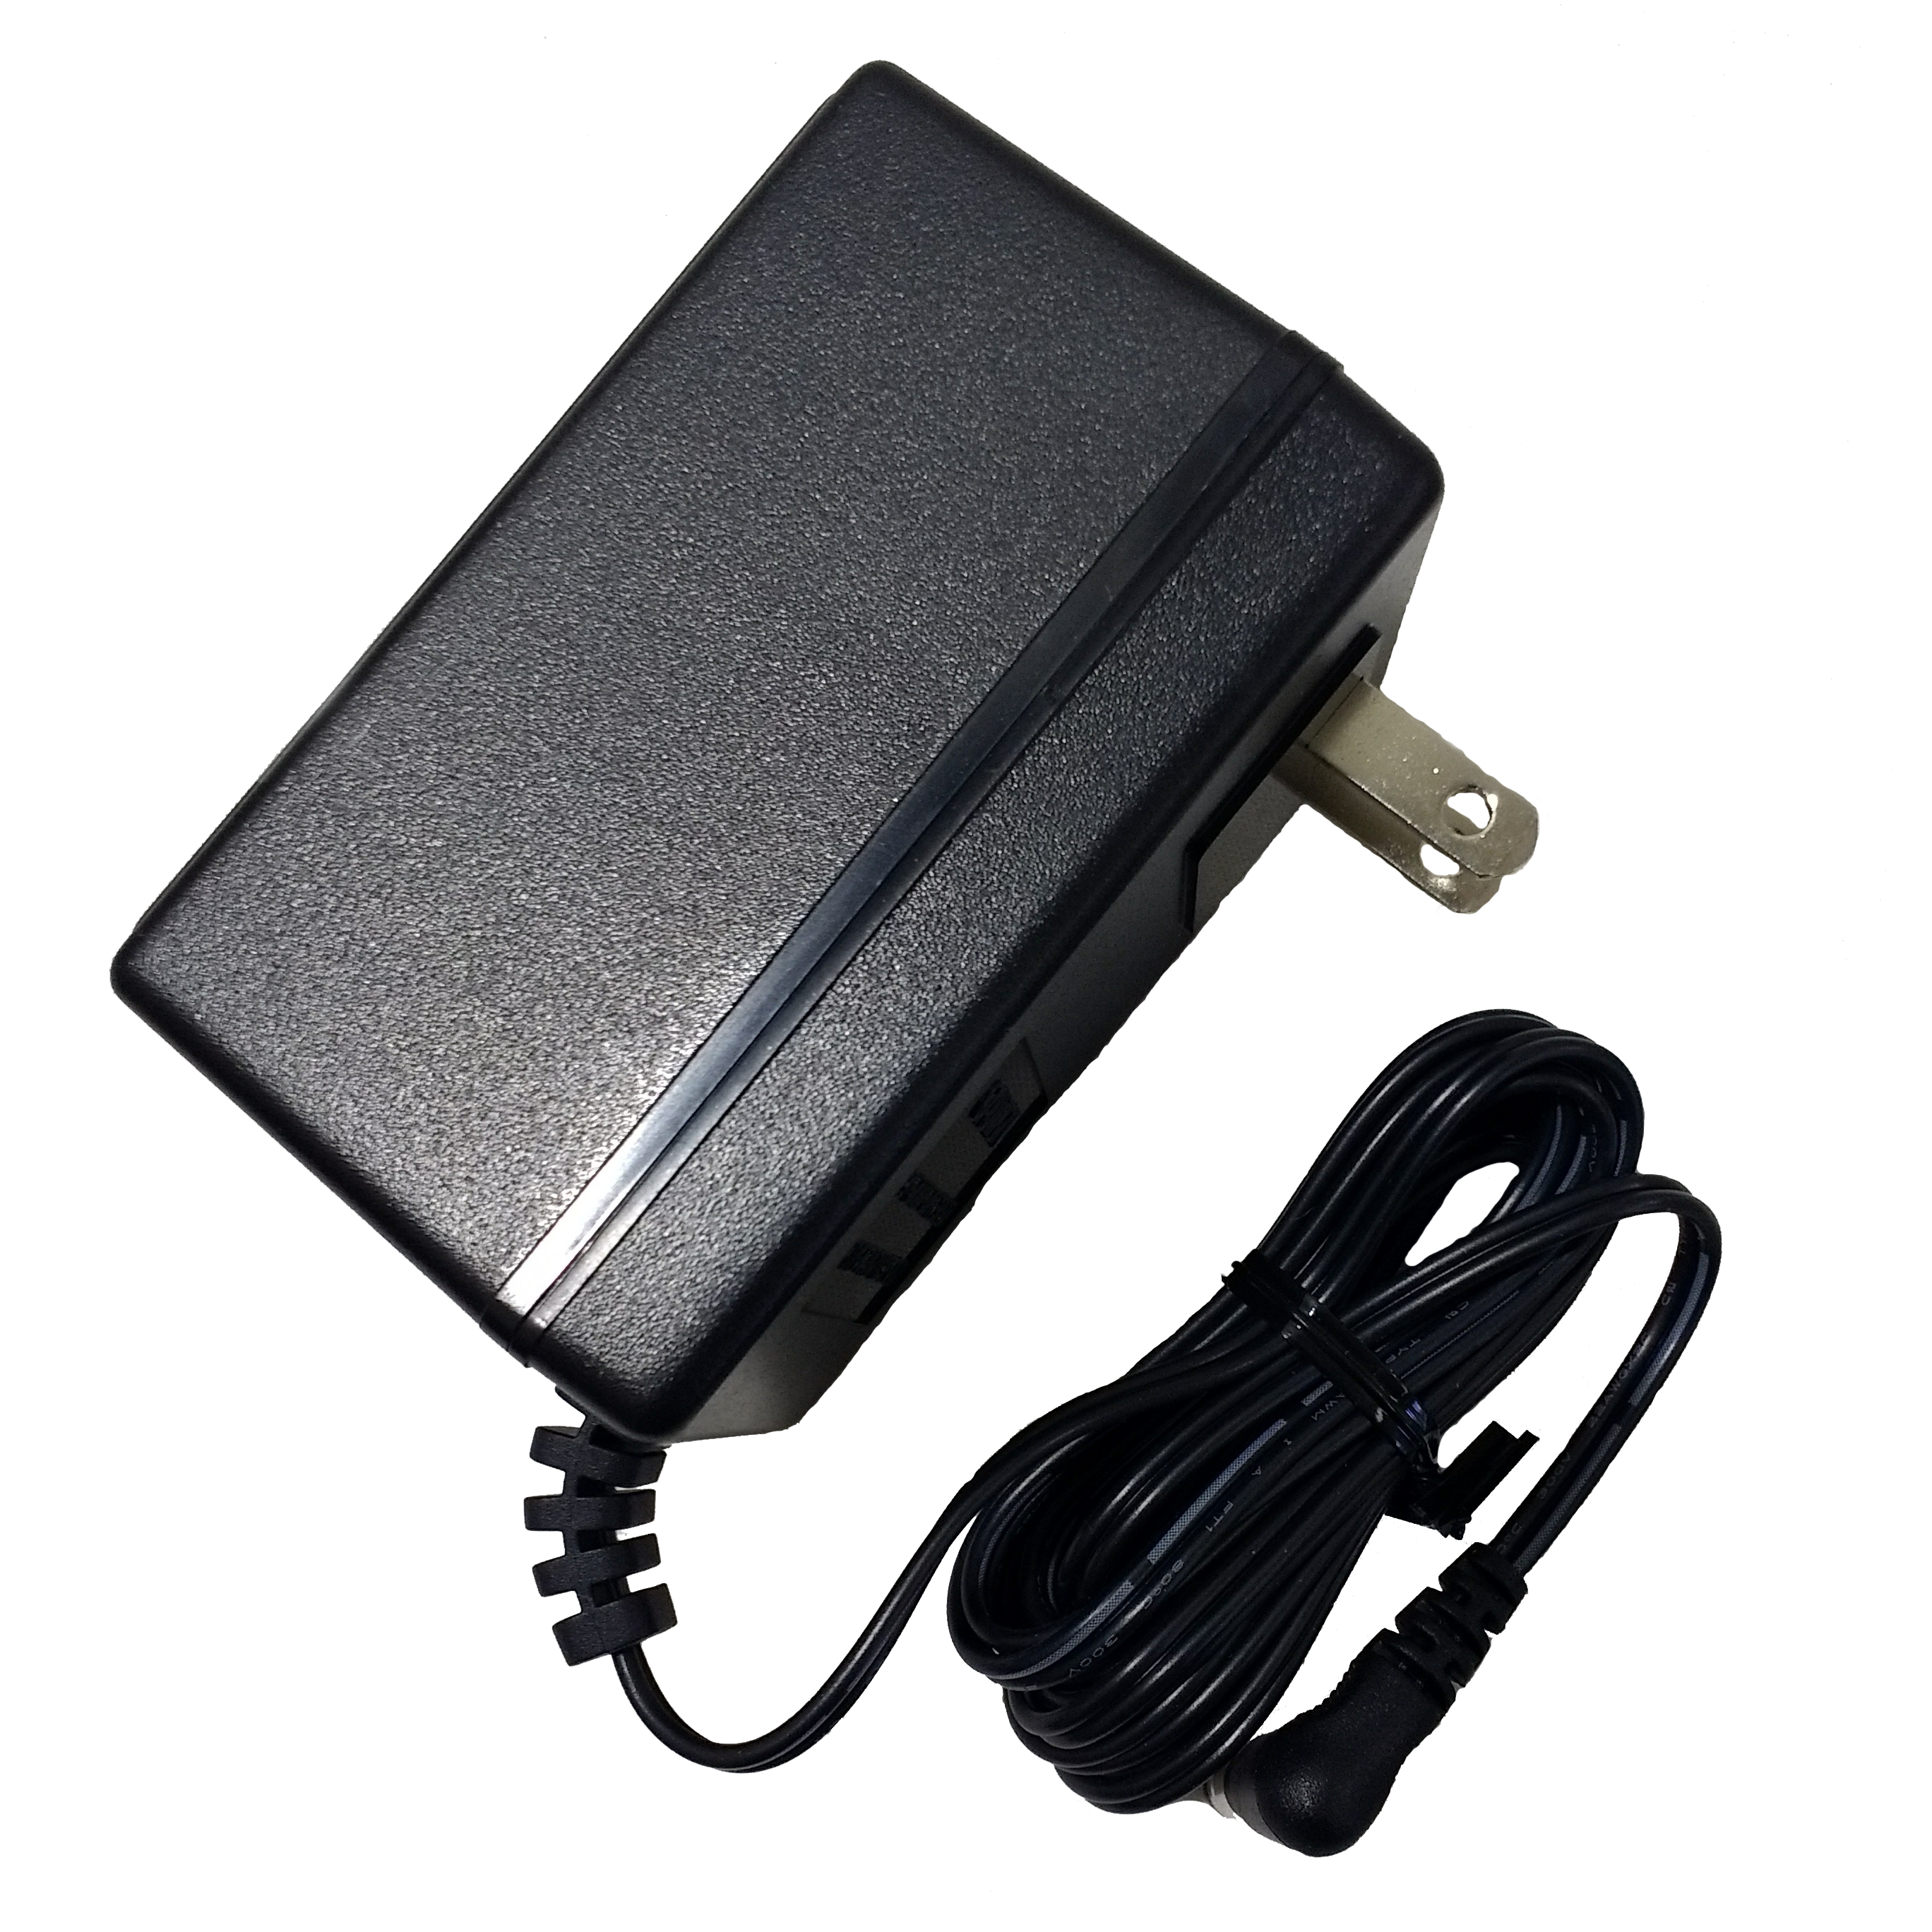 (0A-1237-2012) Daktronics RC-100 & 200 Controller Charger